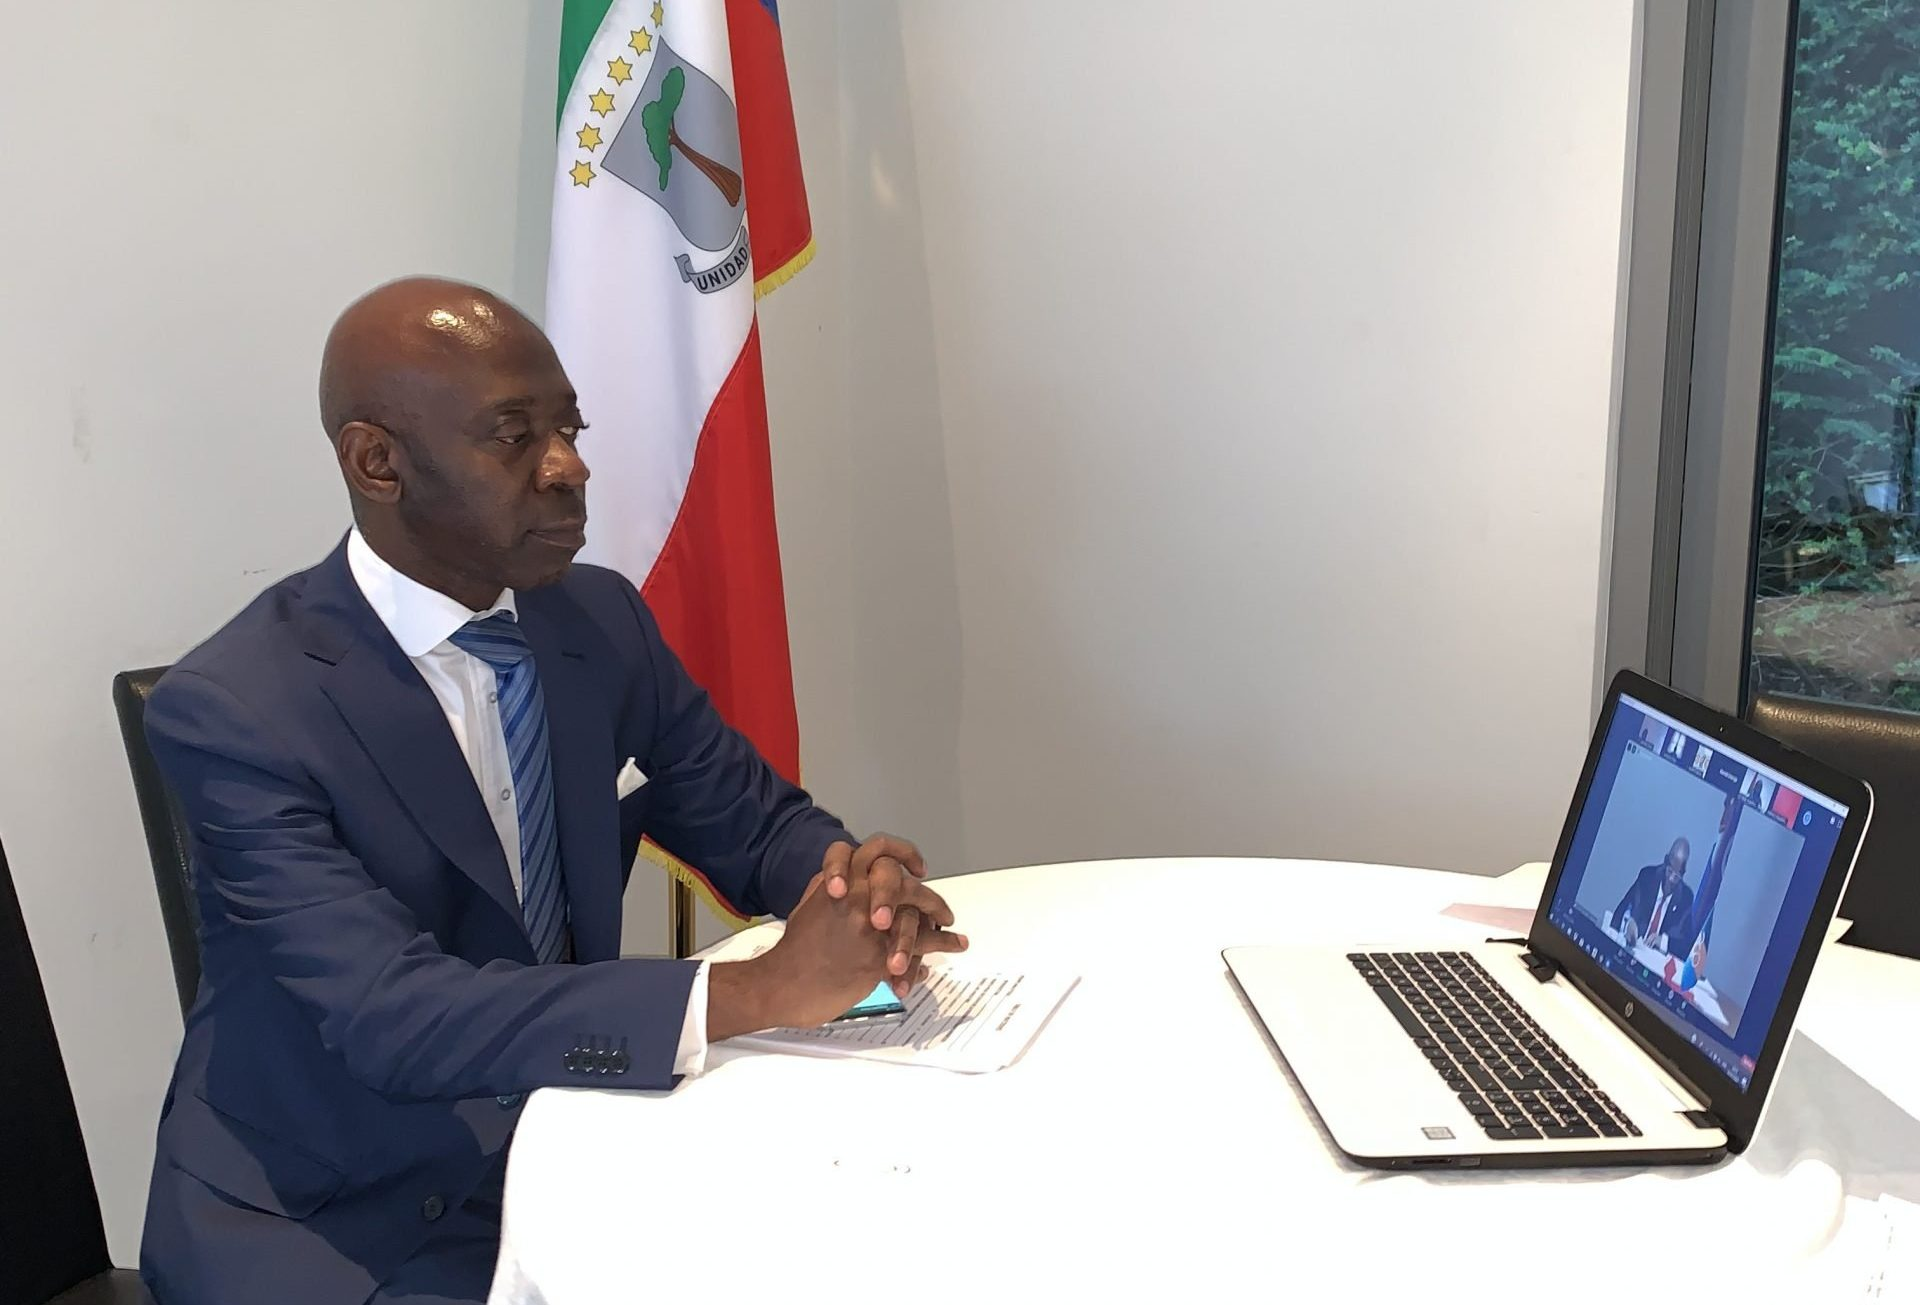 Consejo de Ministros de la OEACP